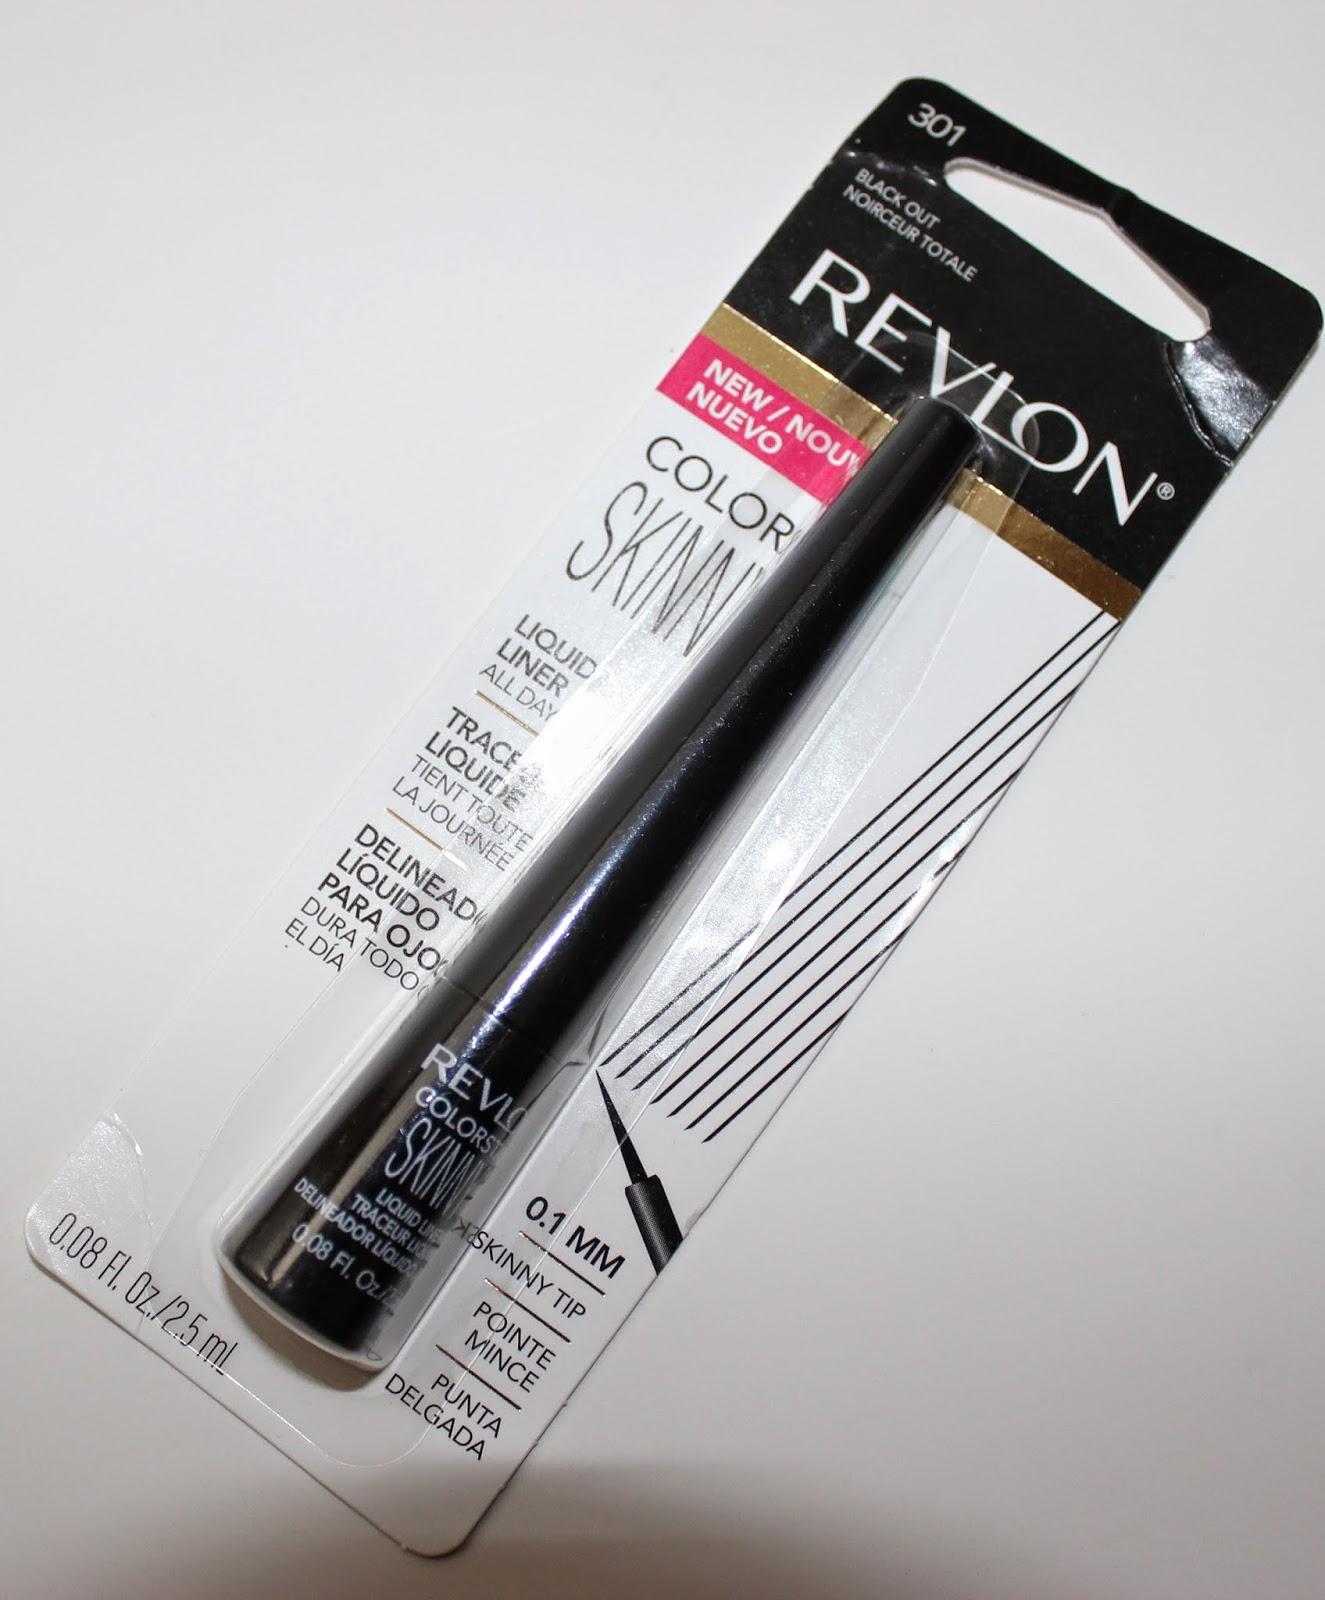 Revlon ColorStay Skinny Liquid Liner in Black Out Packaging